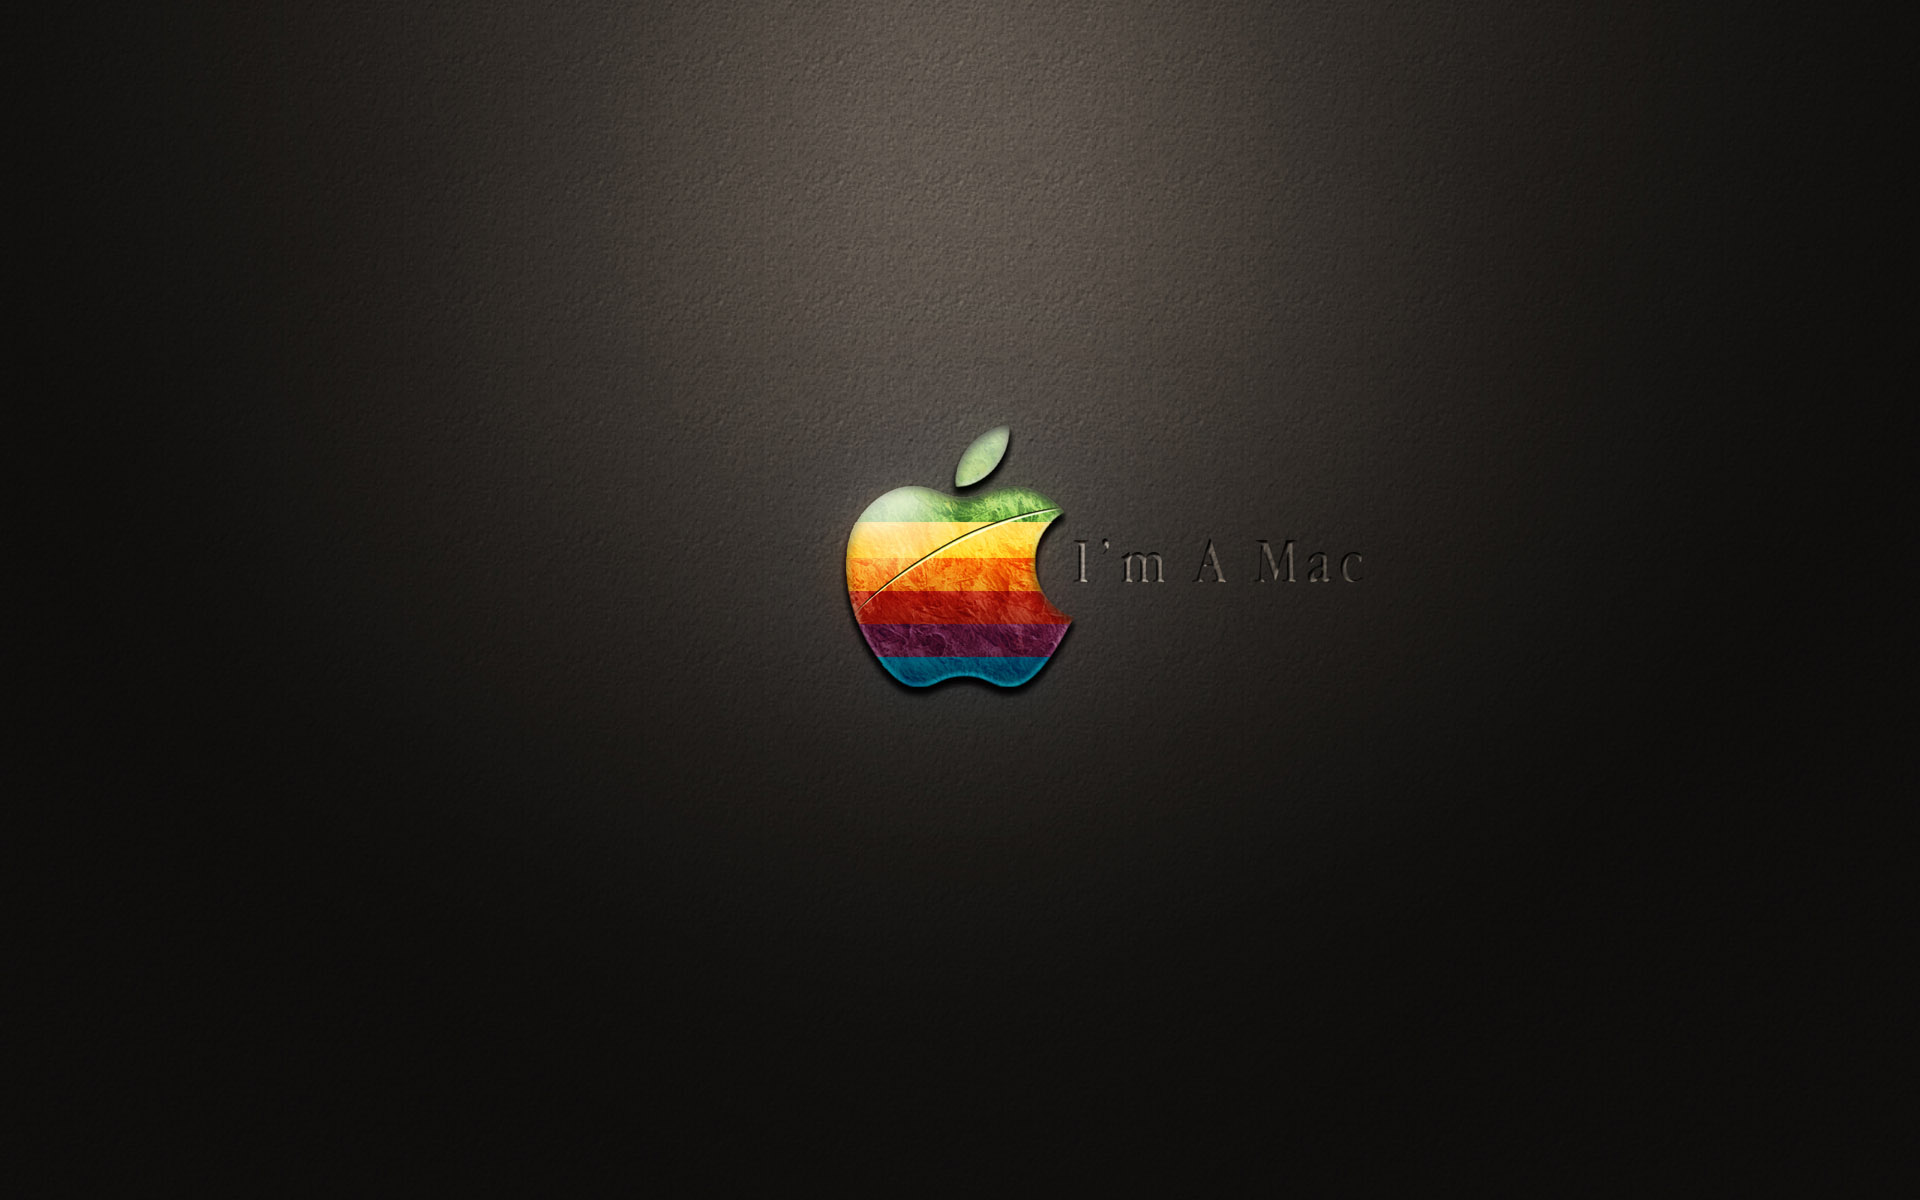 wallpaper apple mac wallpapers elegant 1920x1200 1920x1200